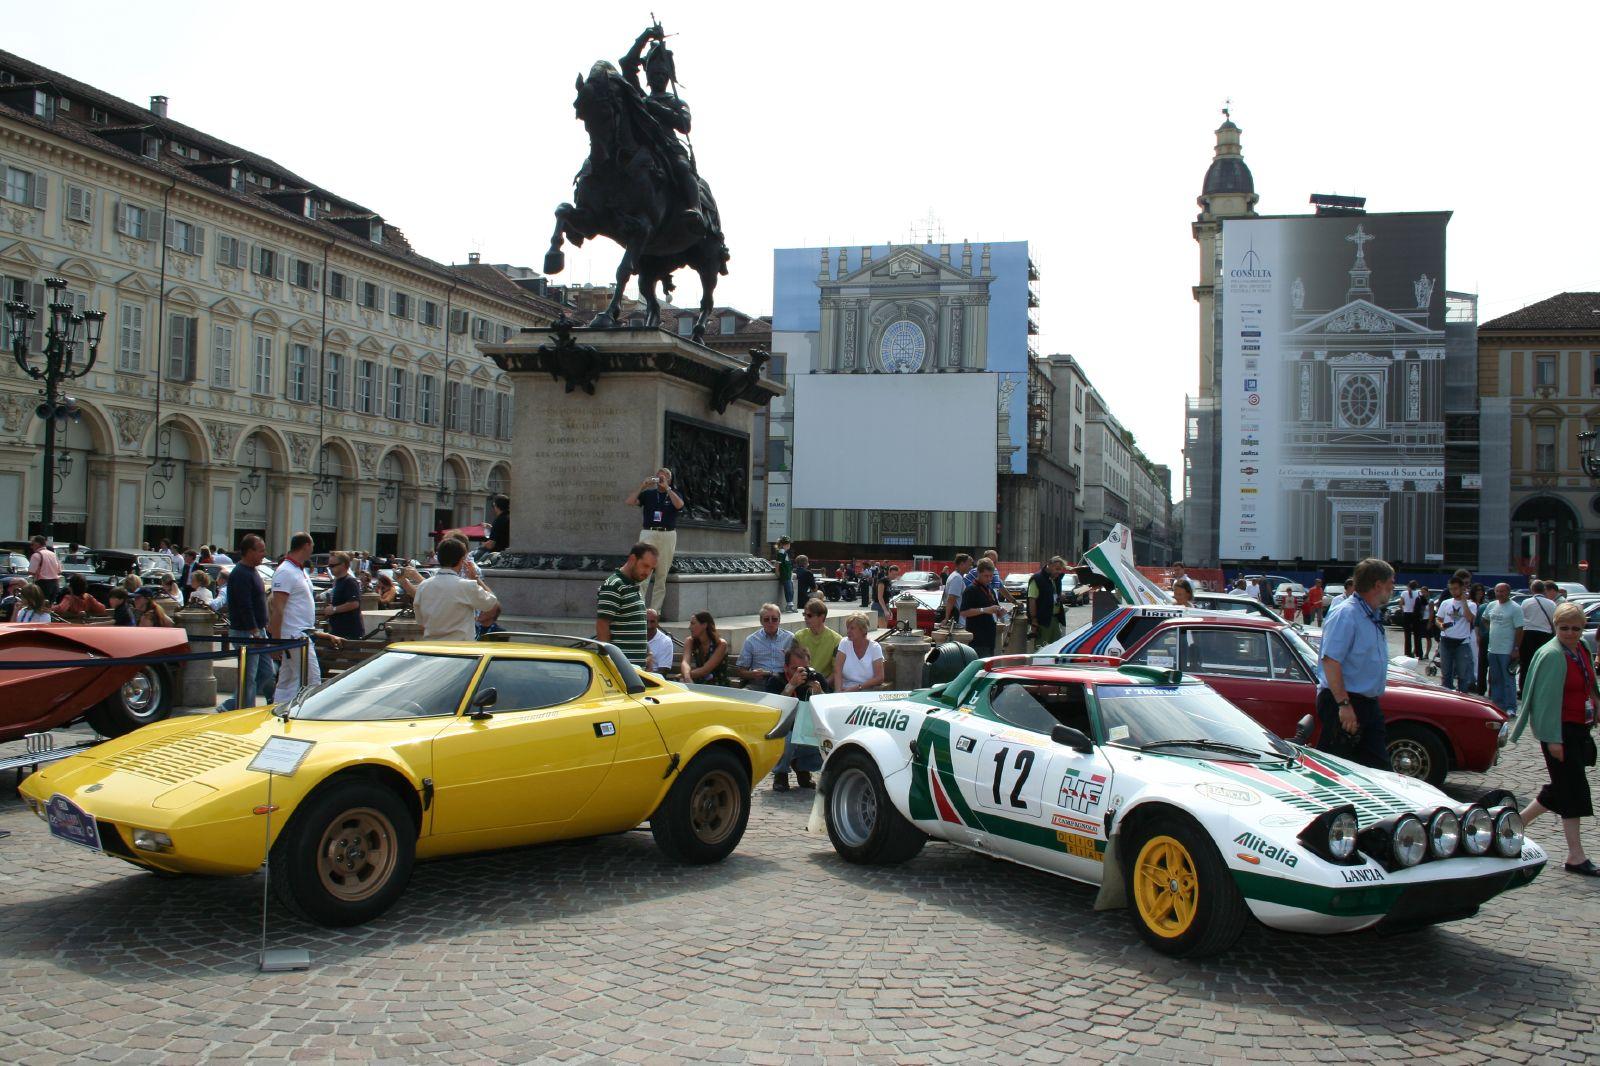 https://upload.wikimedia.org/wikipedia/commons/6/67/Lancia_Stratos_HF_01.jpg